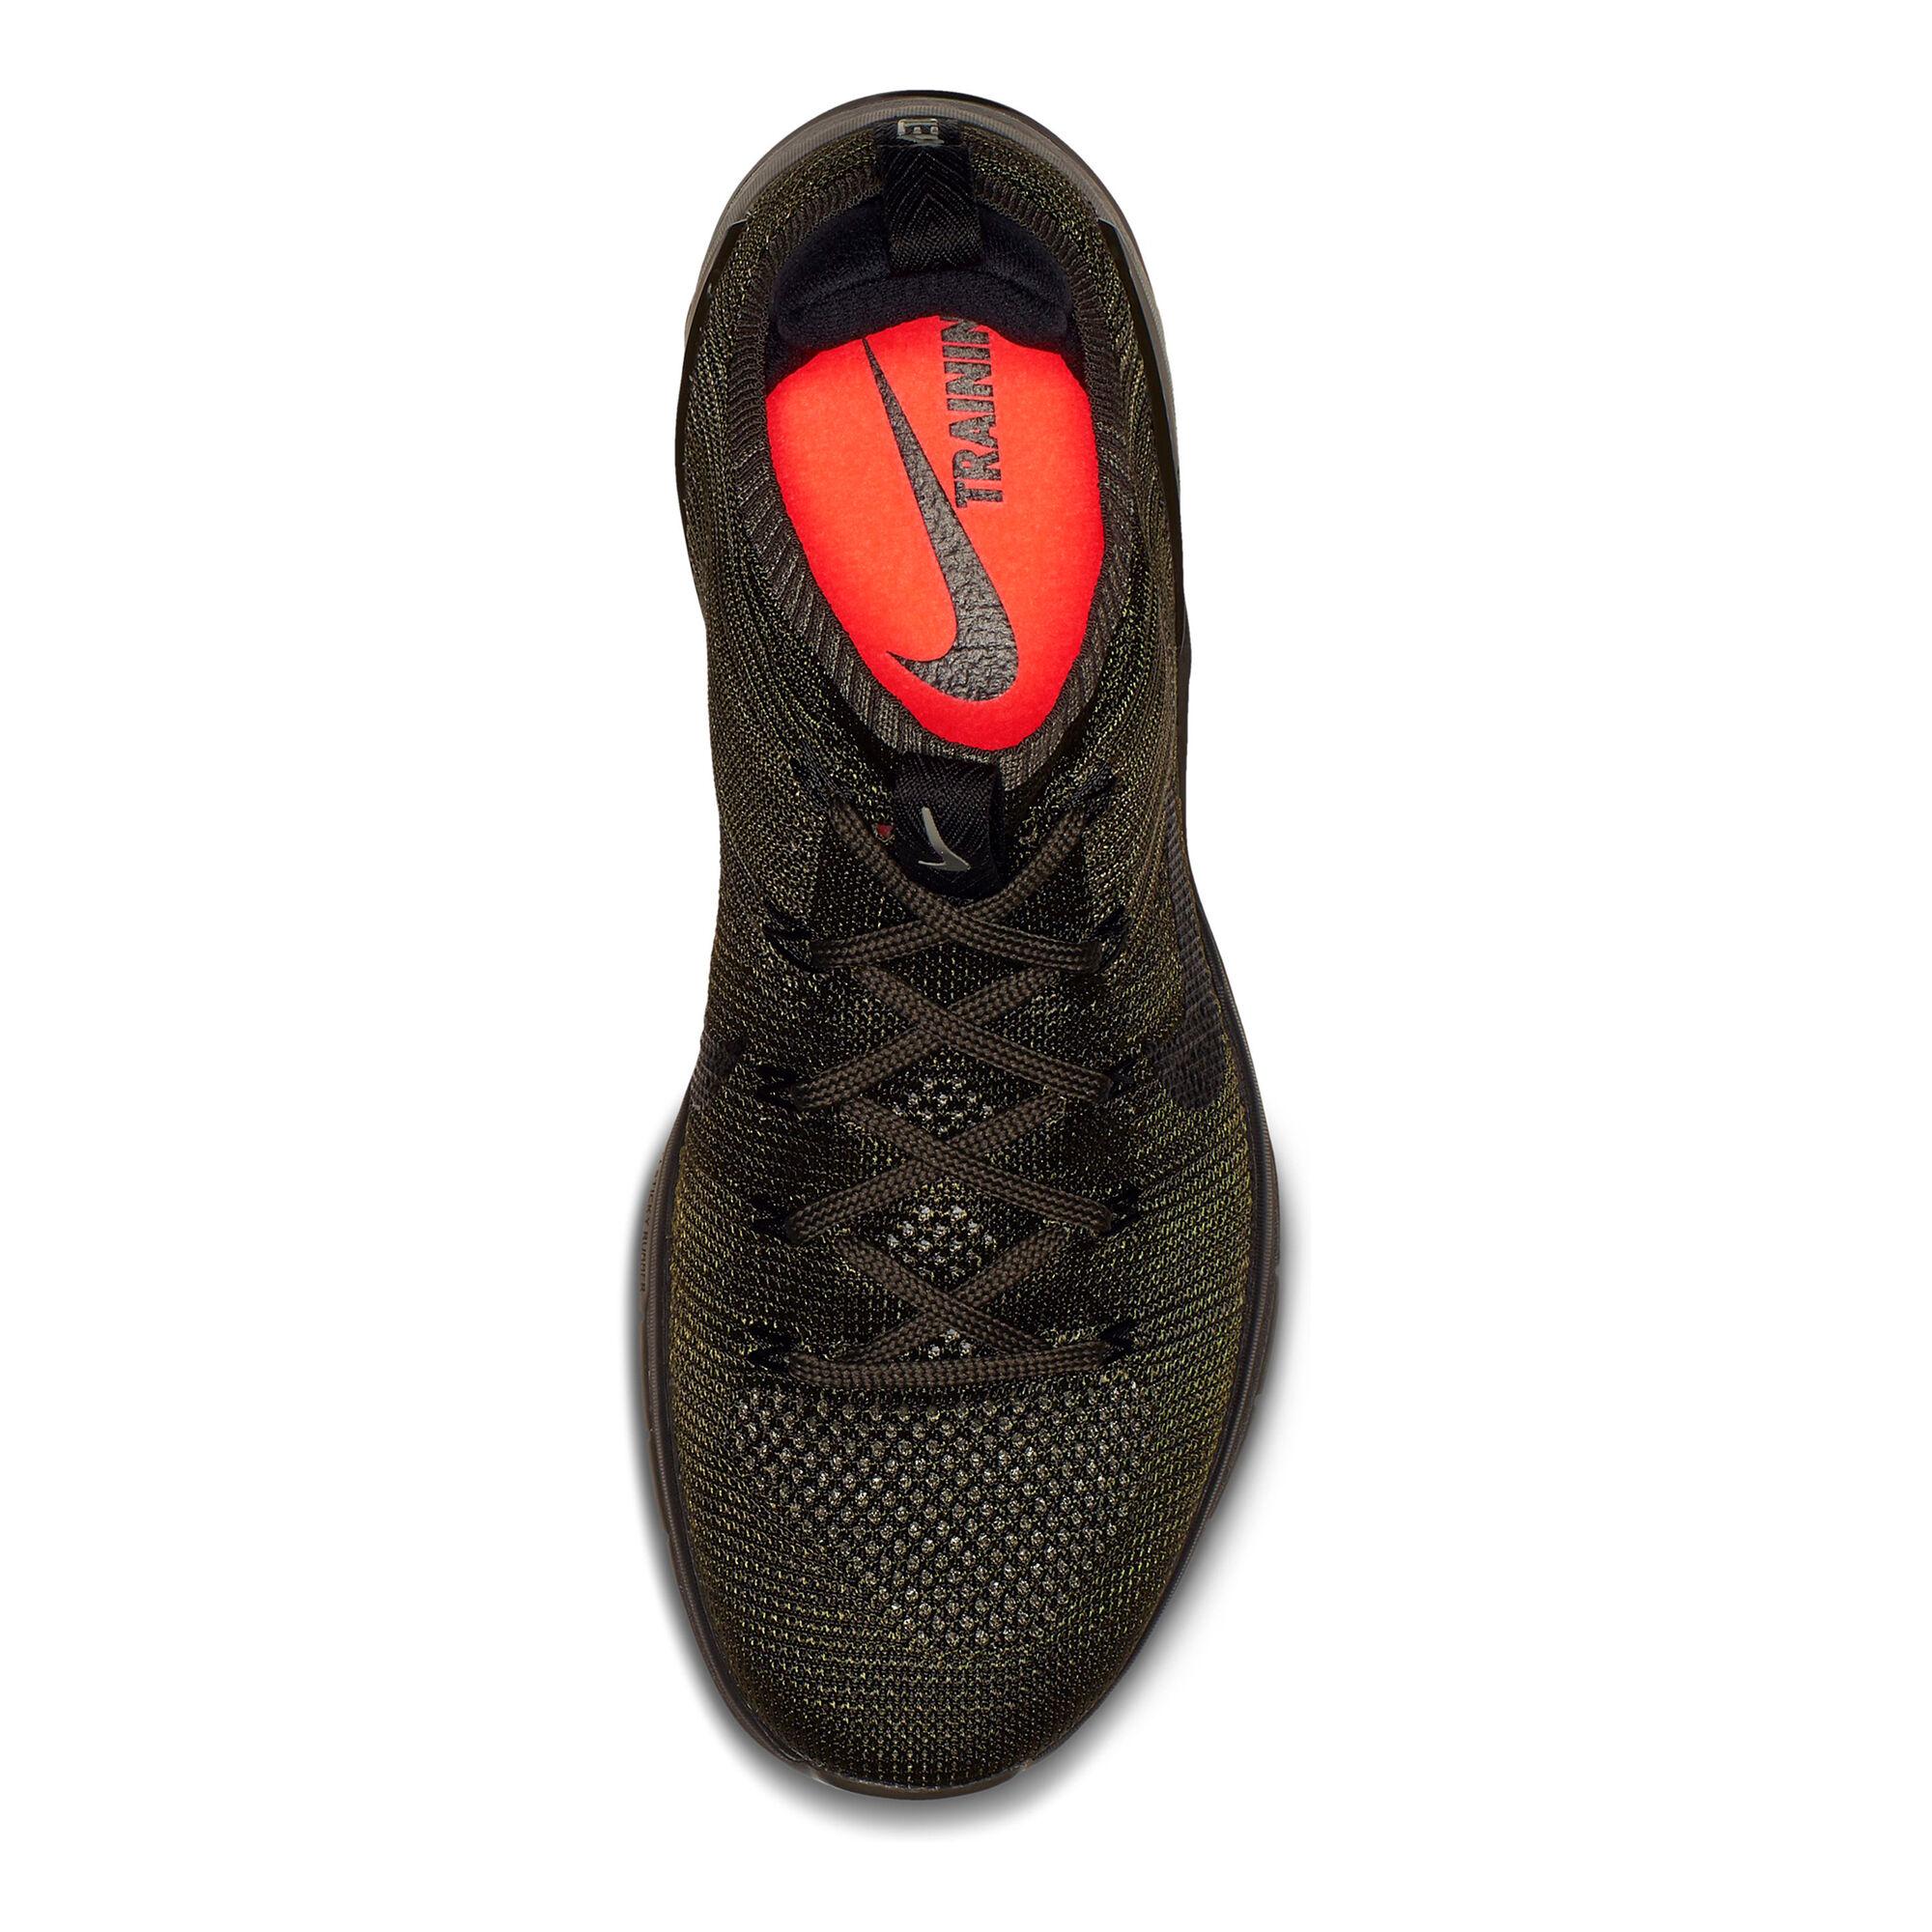 0bab0b12a634 buy Nike Metcon DSX Flyknit 2 Fitness Shoe Men - Dark Grey